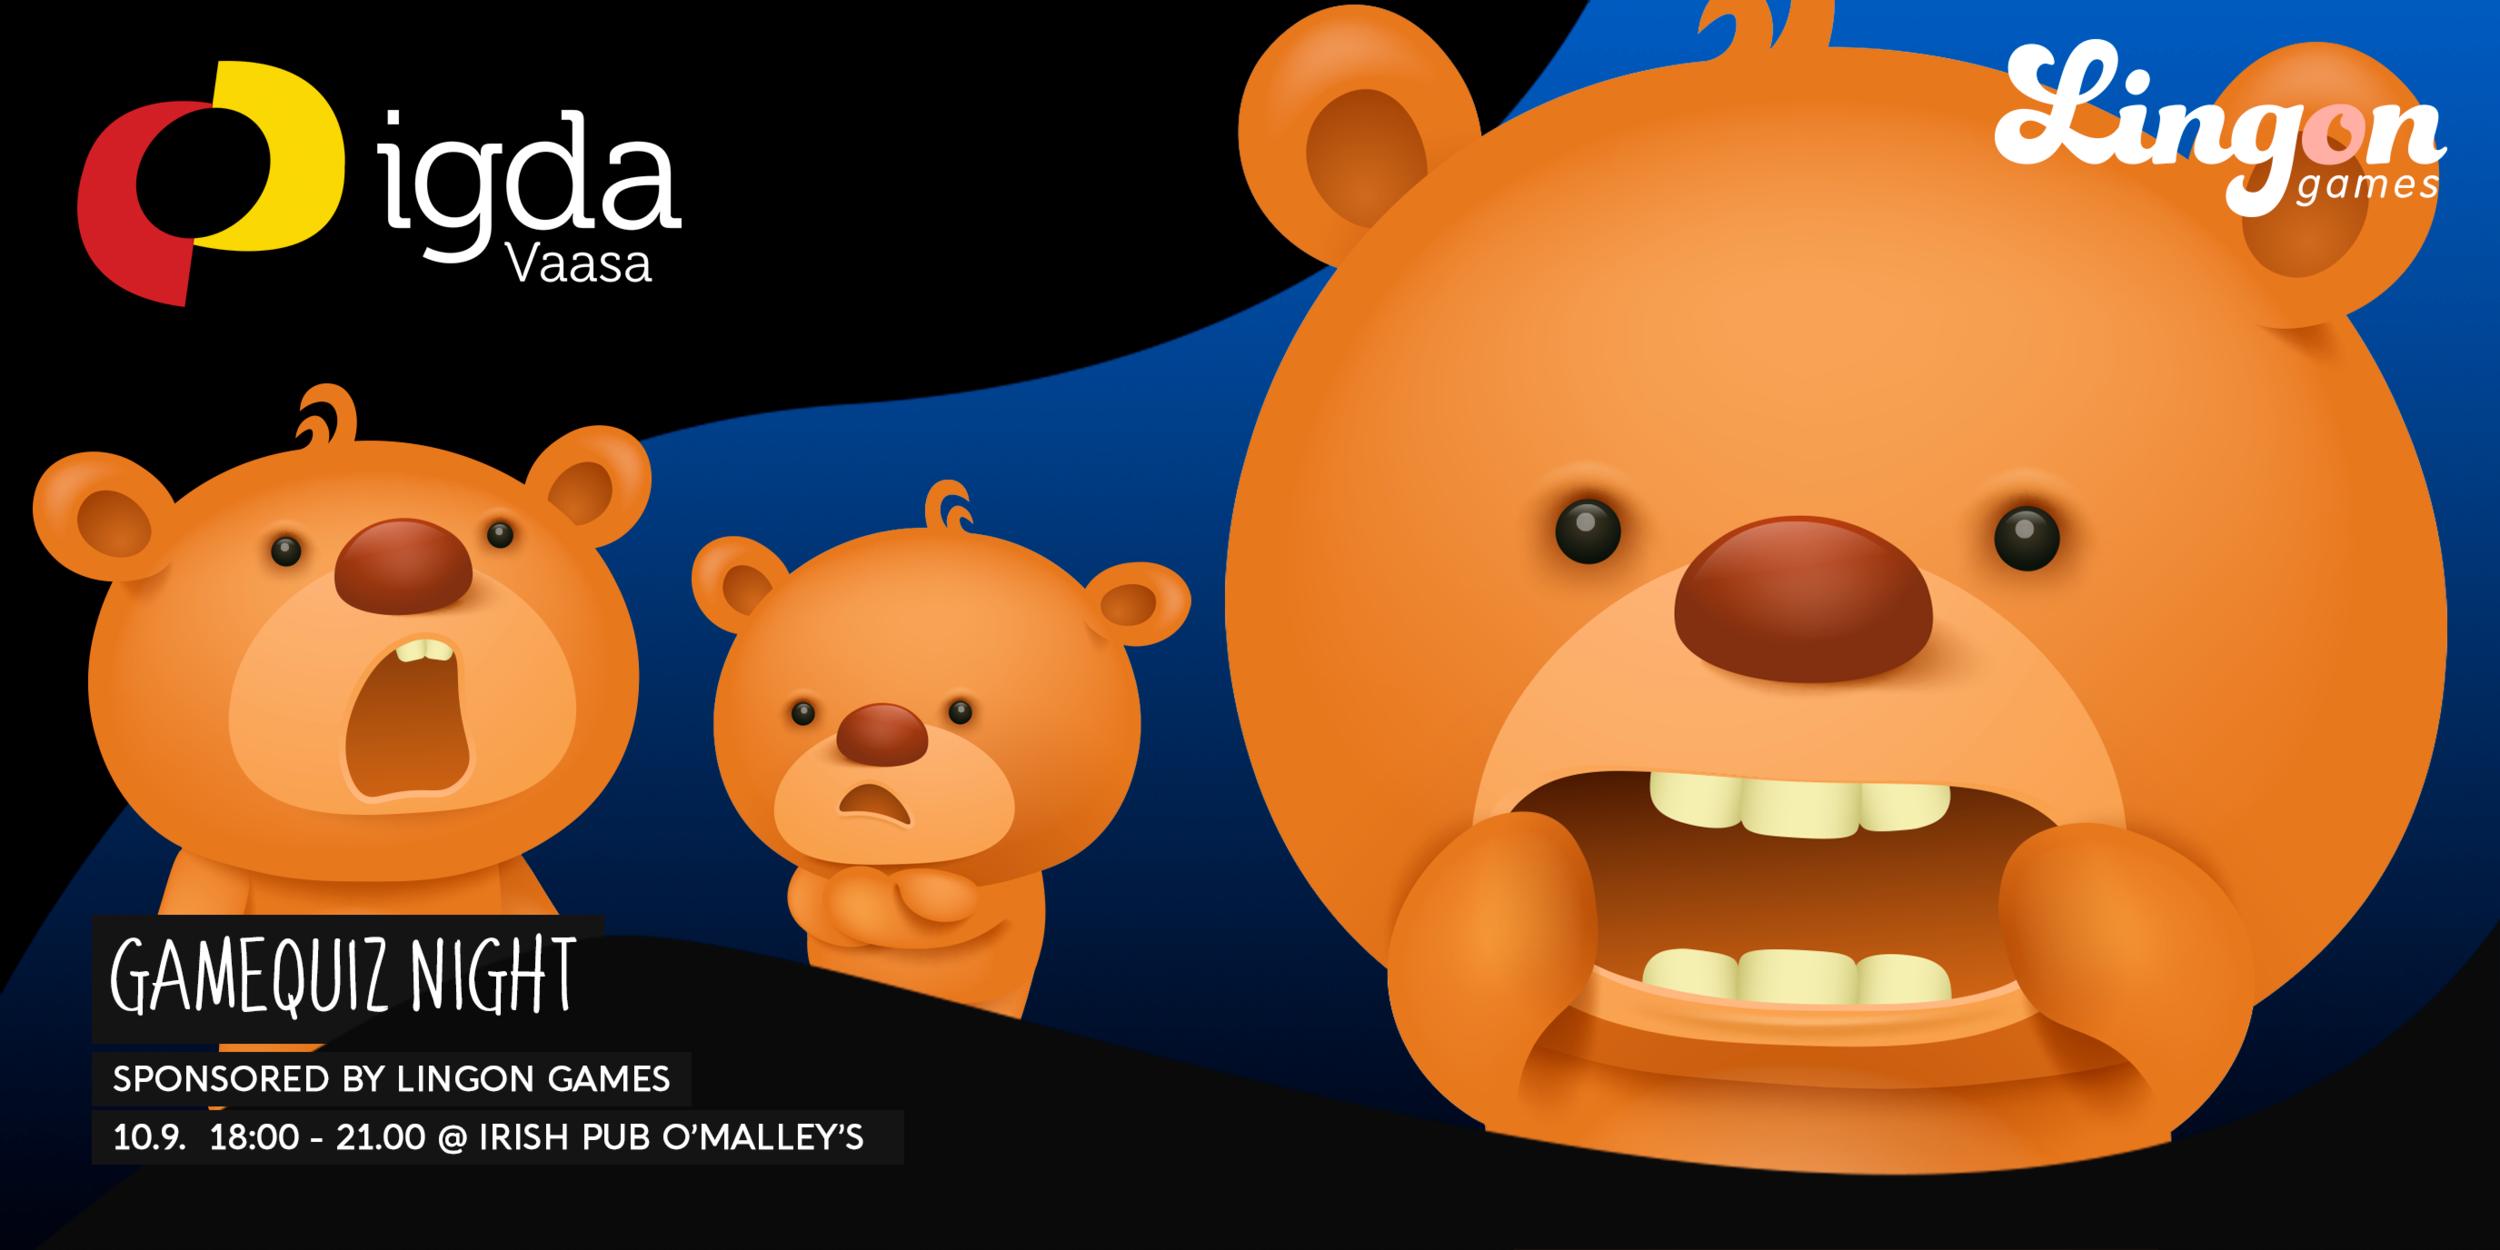 IGDA Vaasa presents: Gamequiz Night by Lingon Games